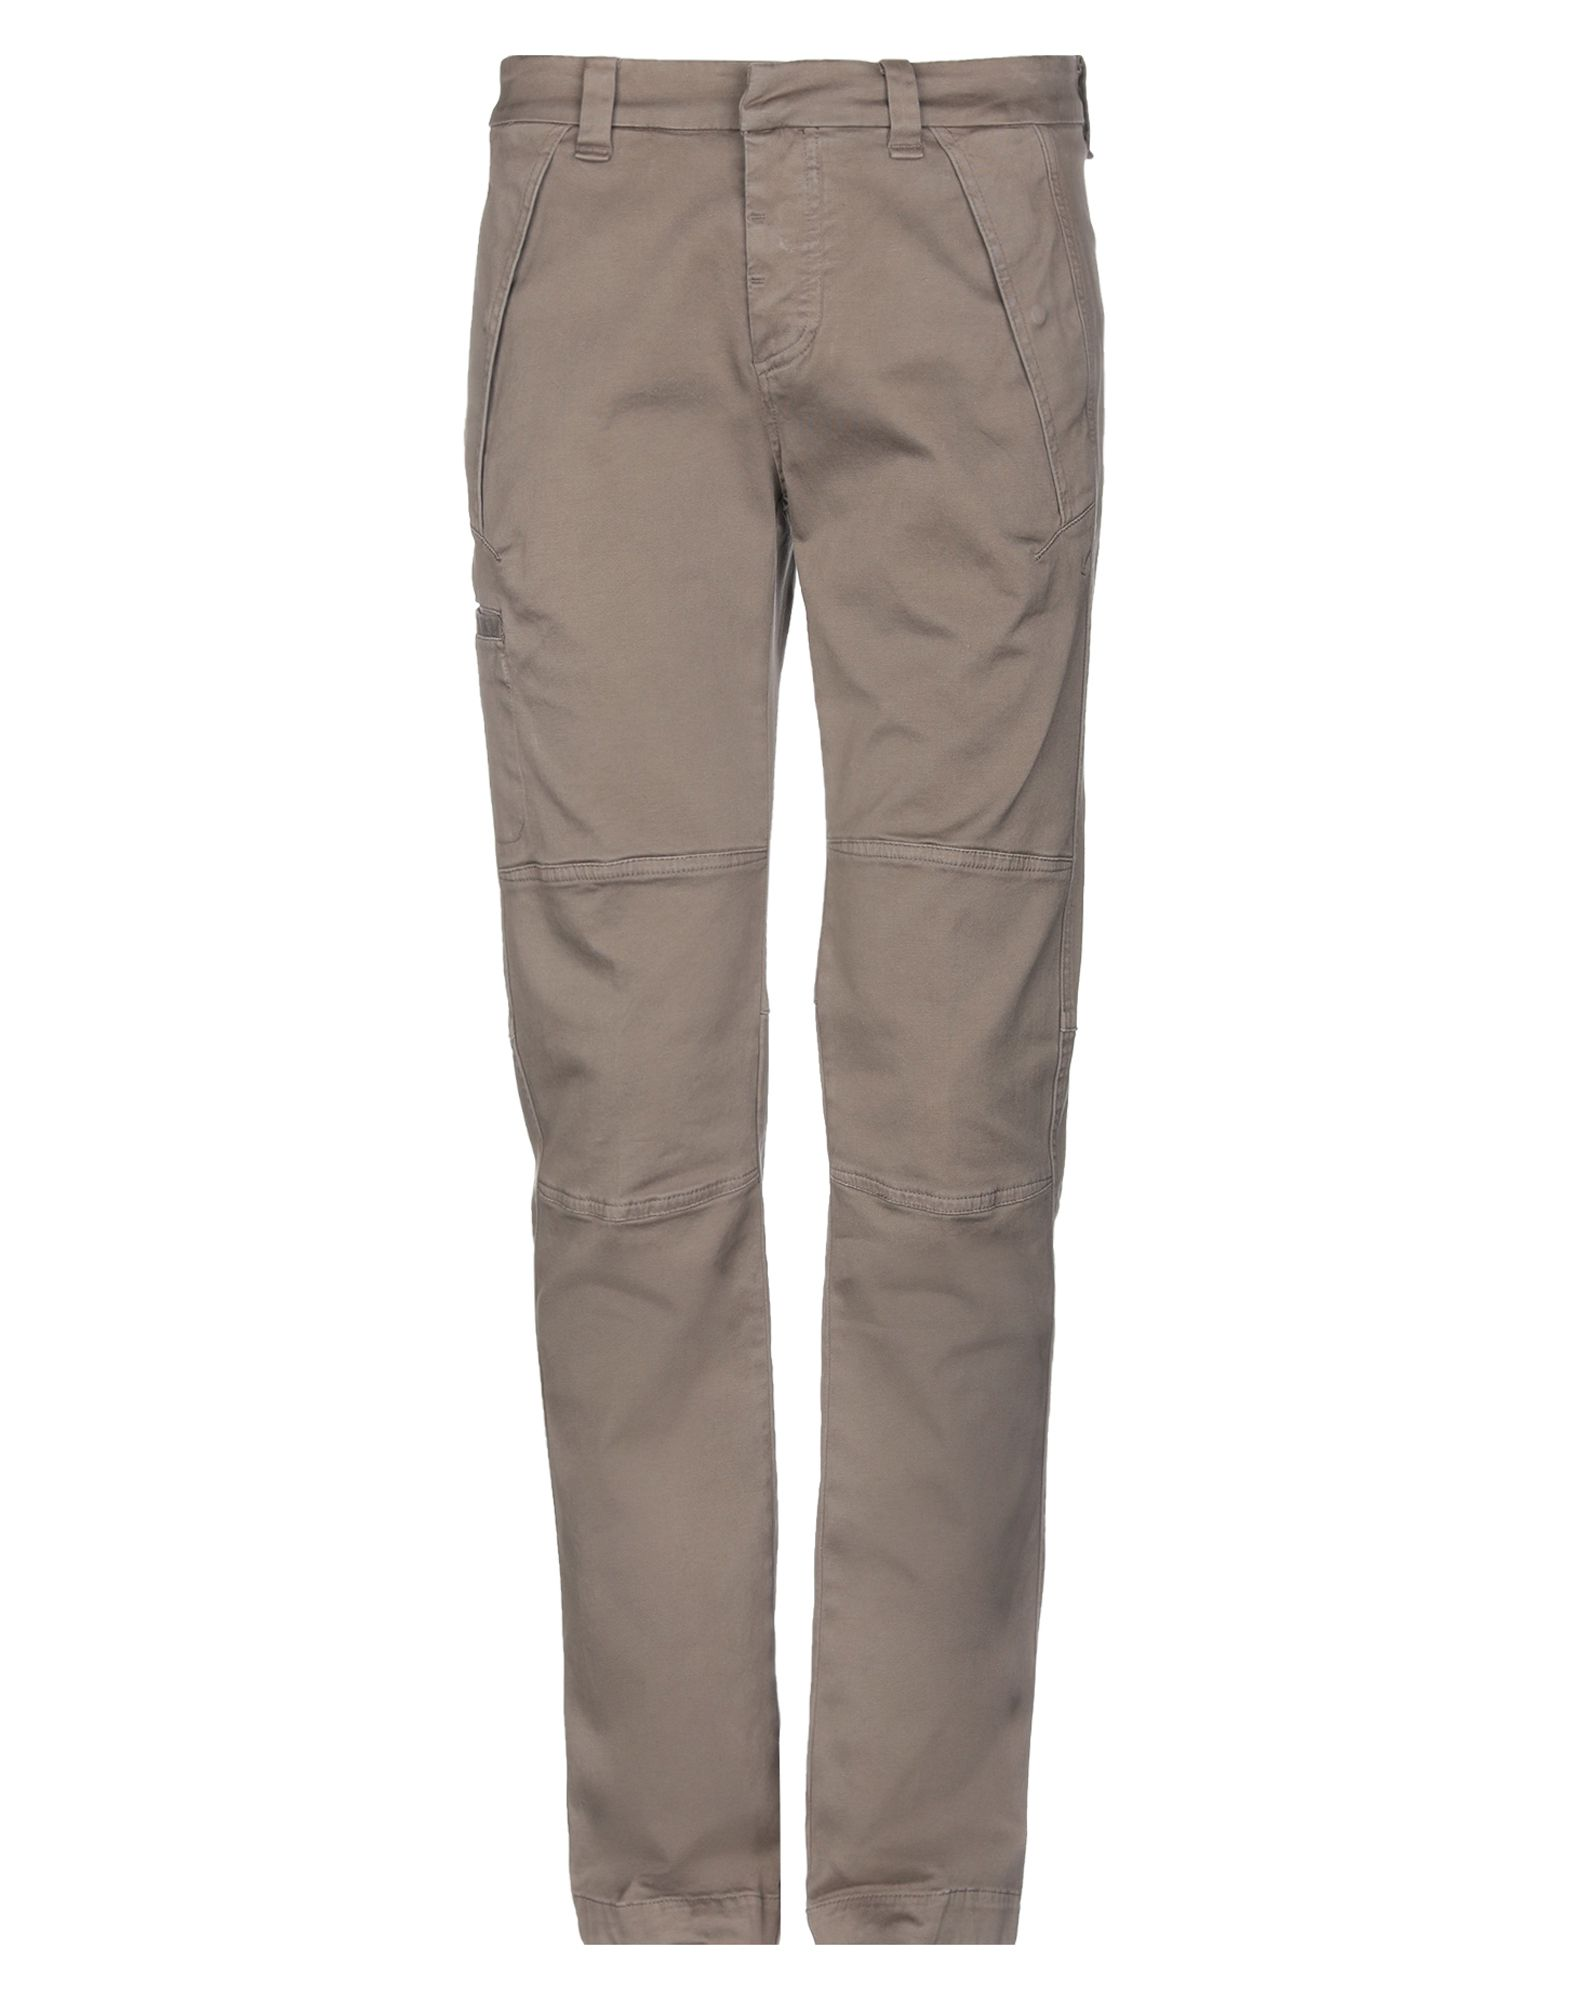 Pantalone Dondup uomo - 13021651FF 13021651FF 13021651FF 337